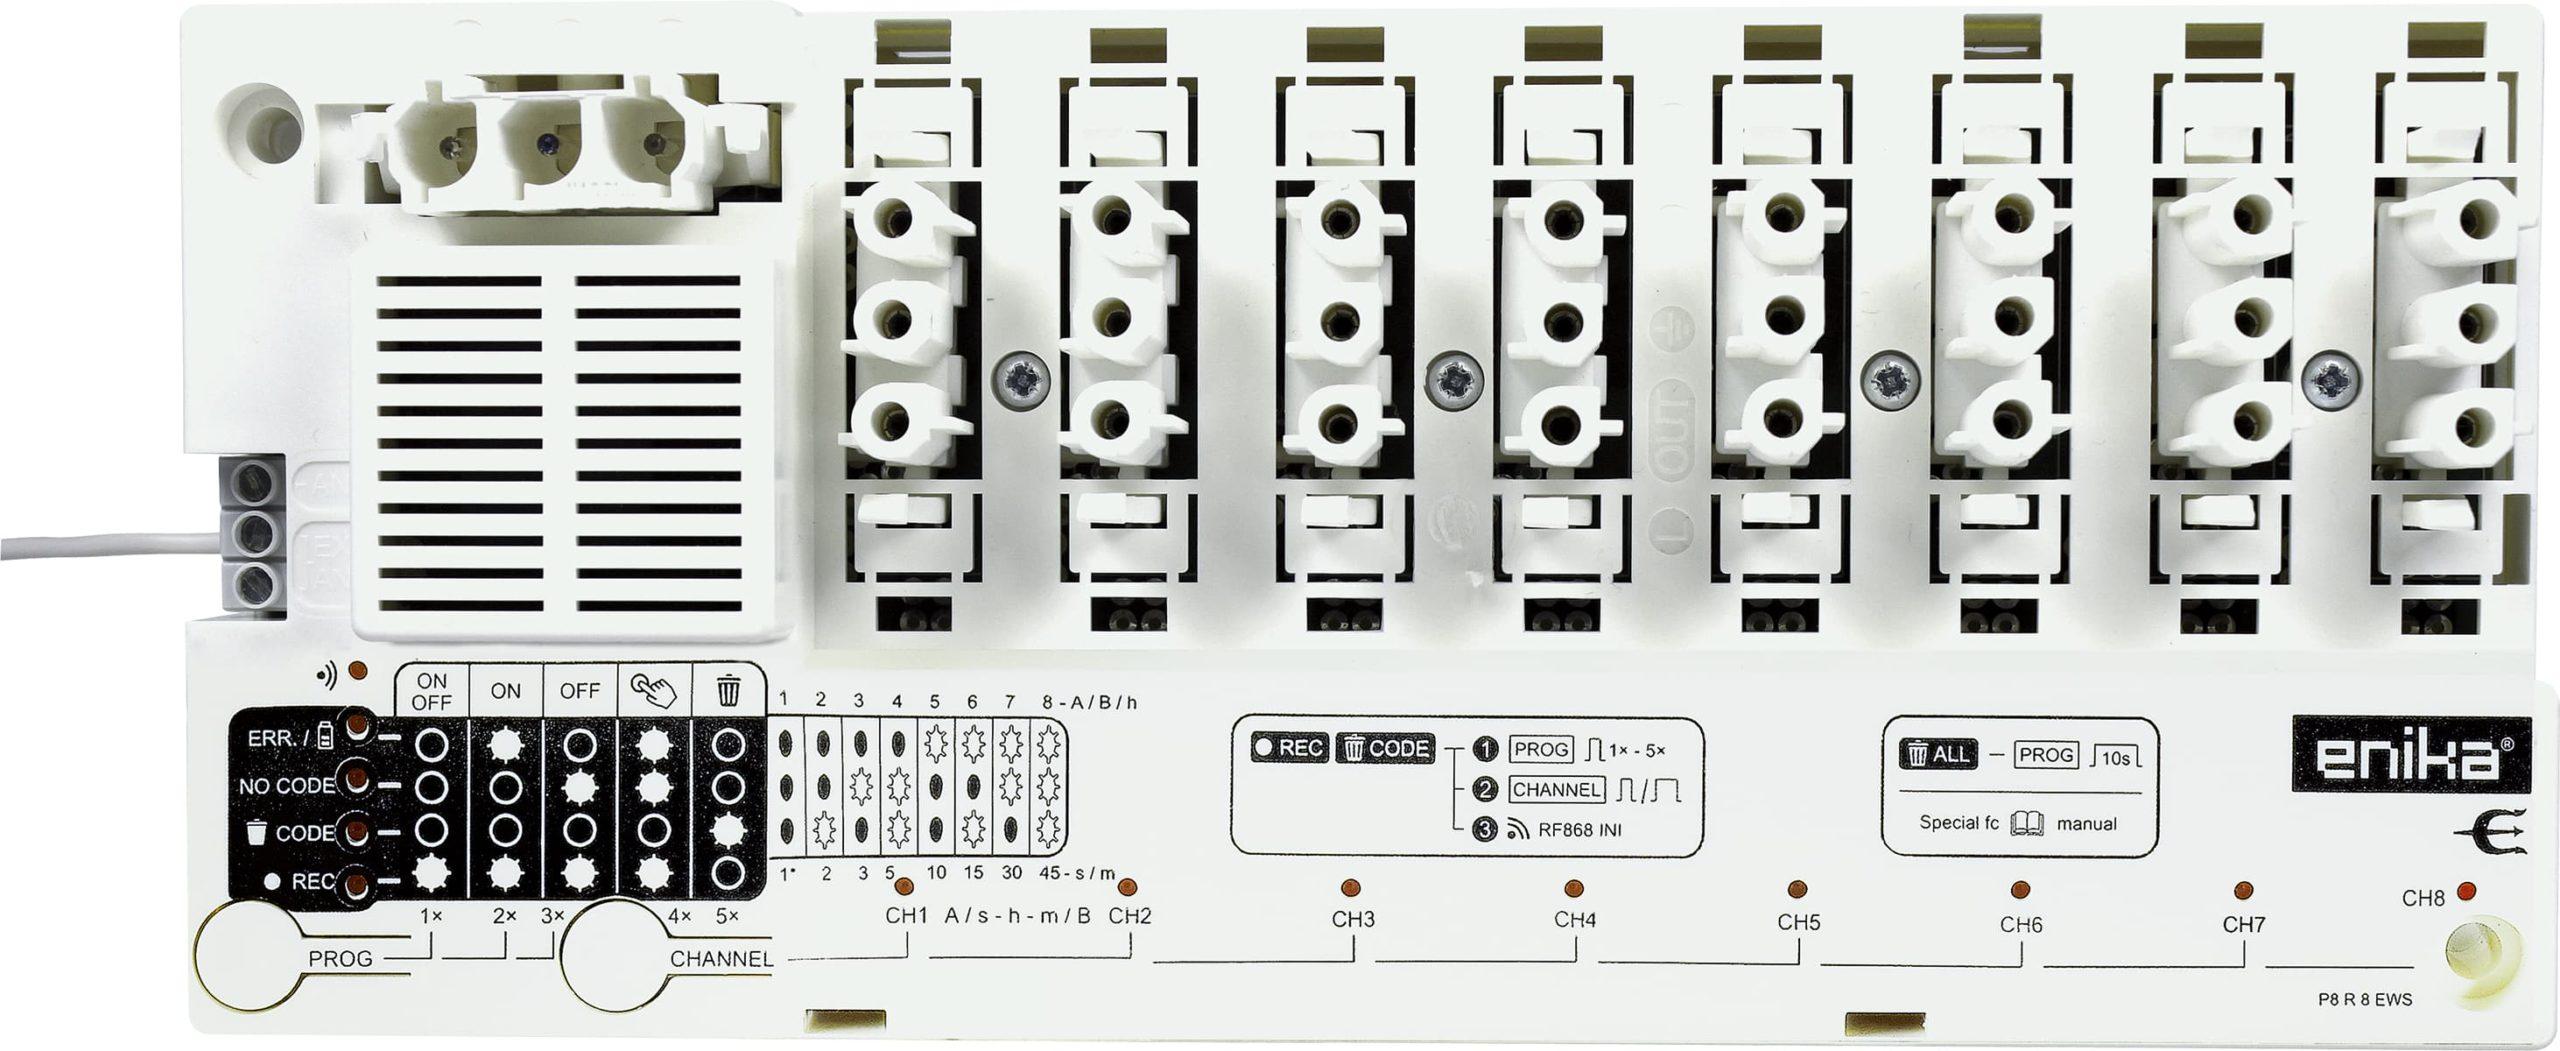 Récepteur 8 voies Poseidon® - ENIKA